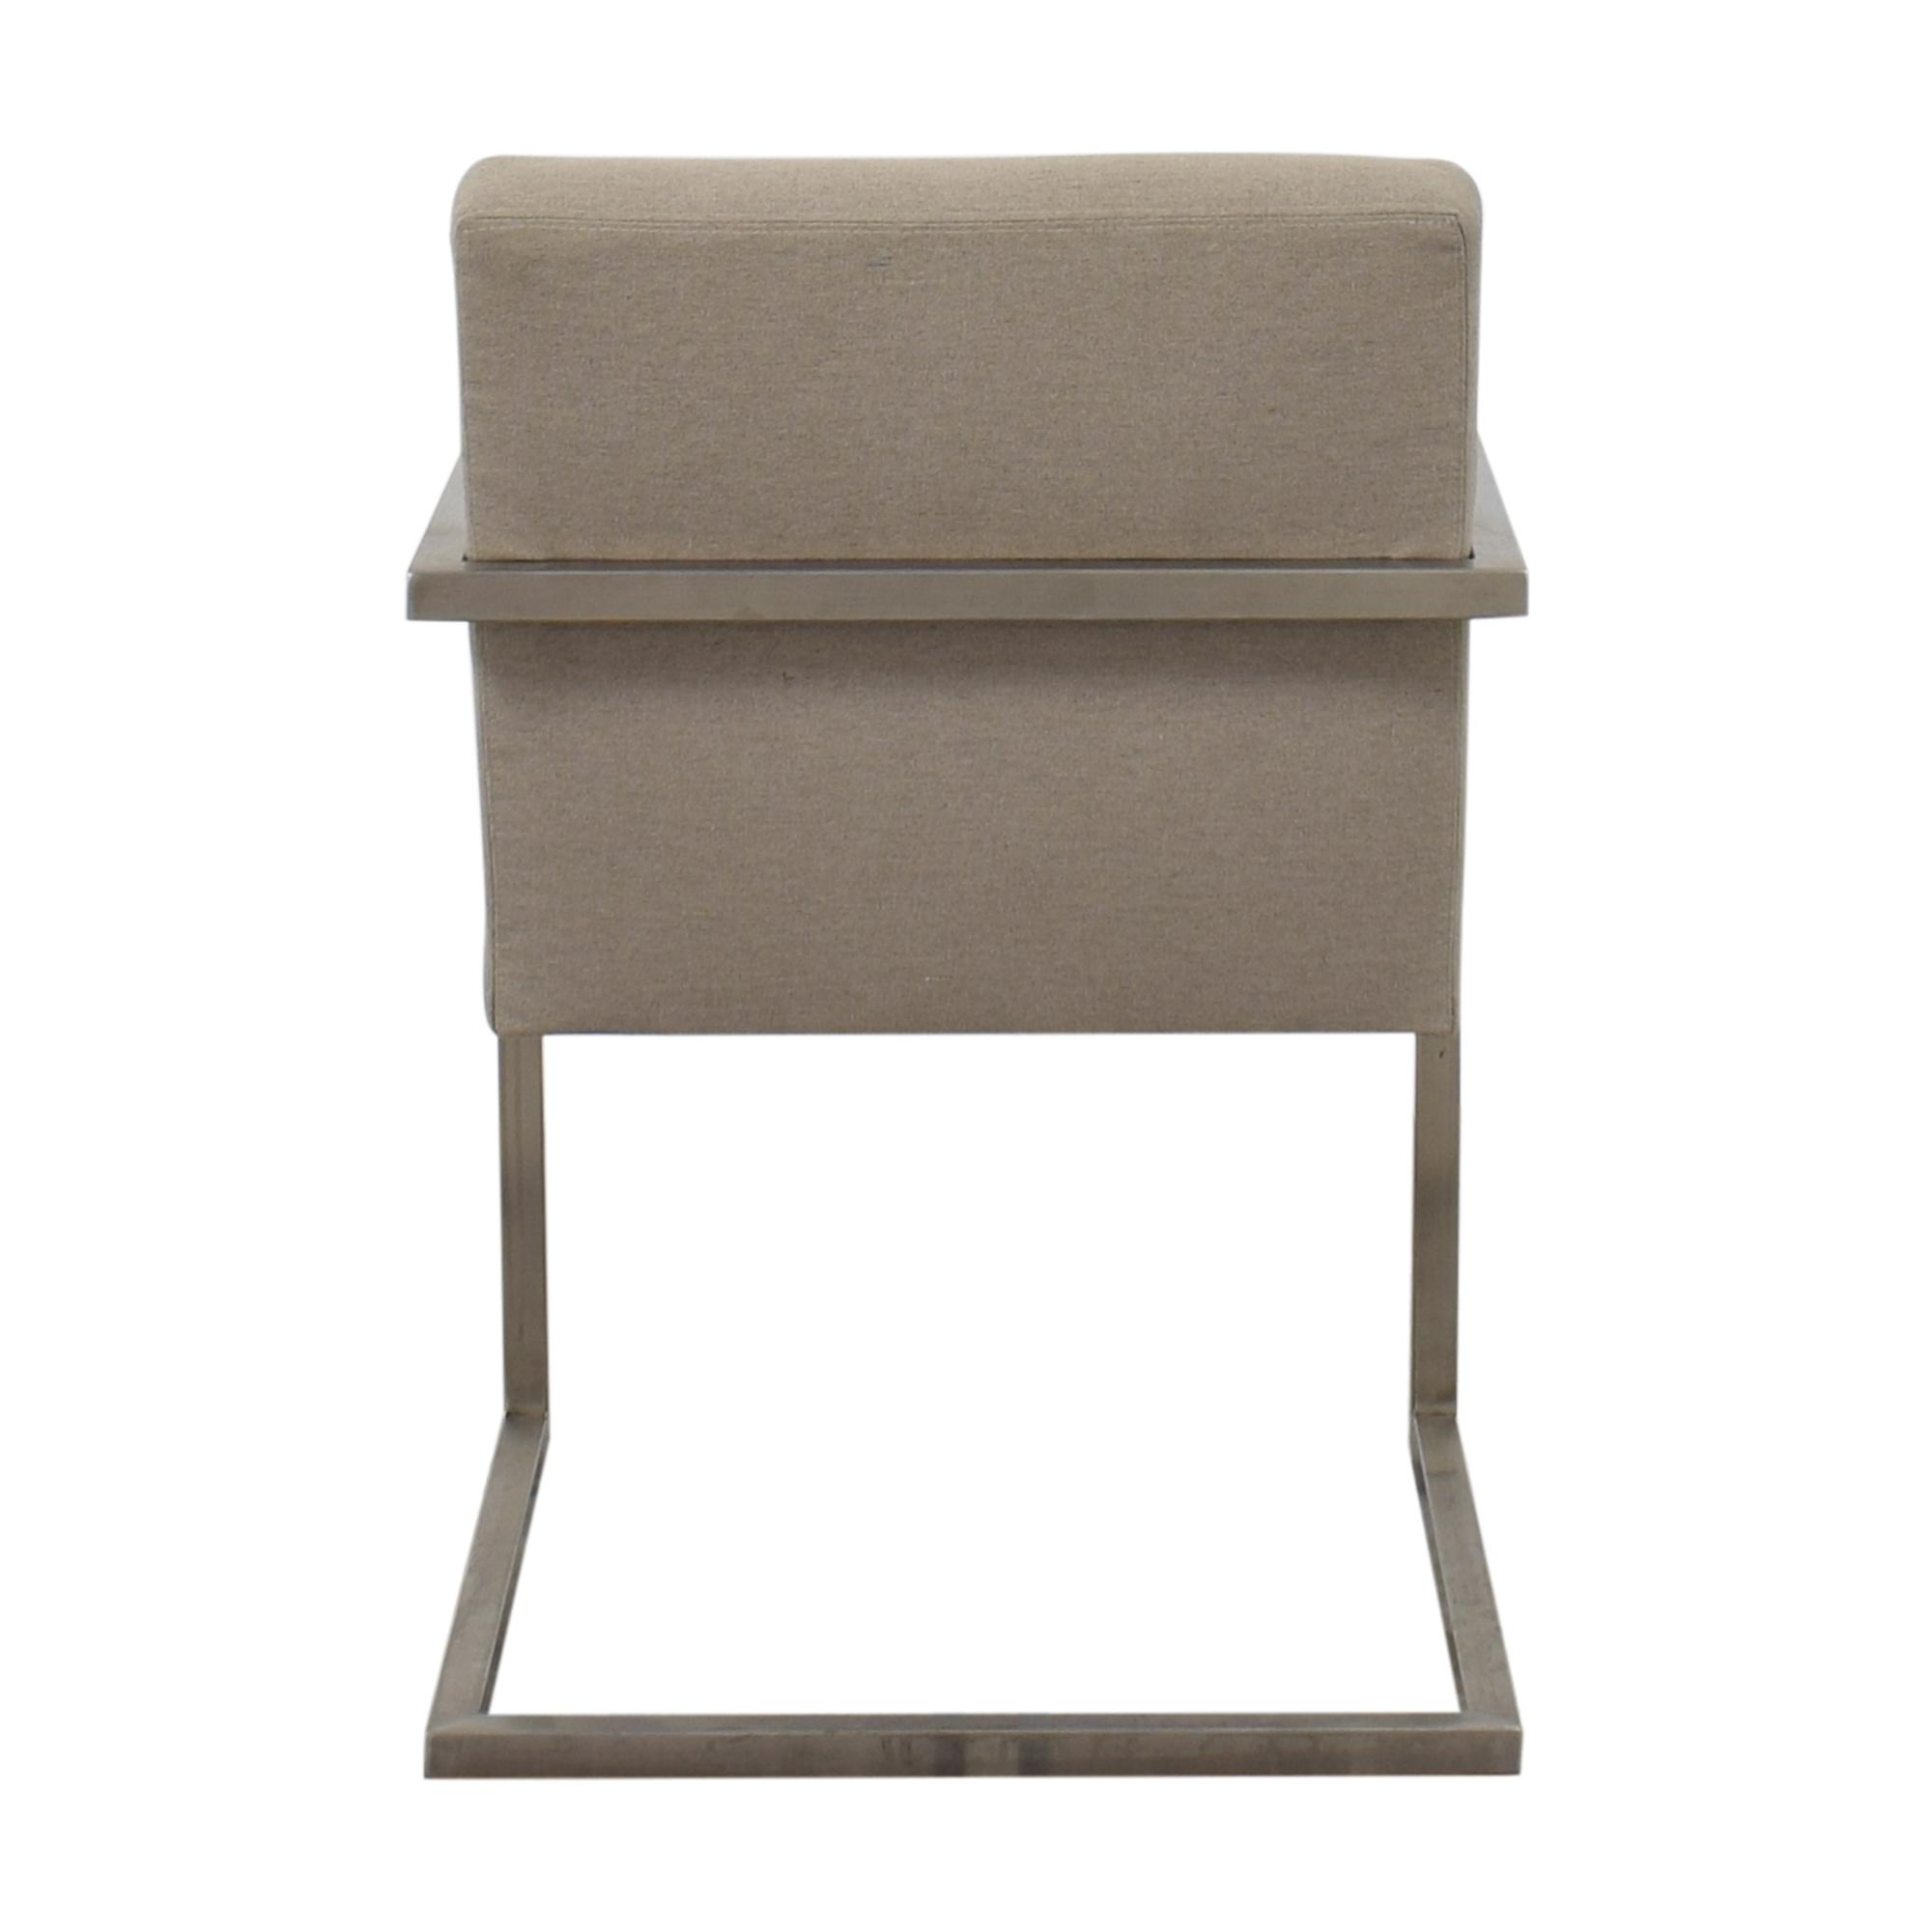 Room & Board Room & Board Lira Dining Arm Chair silver & grey